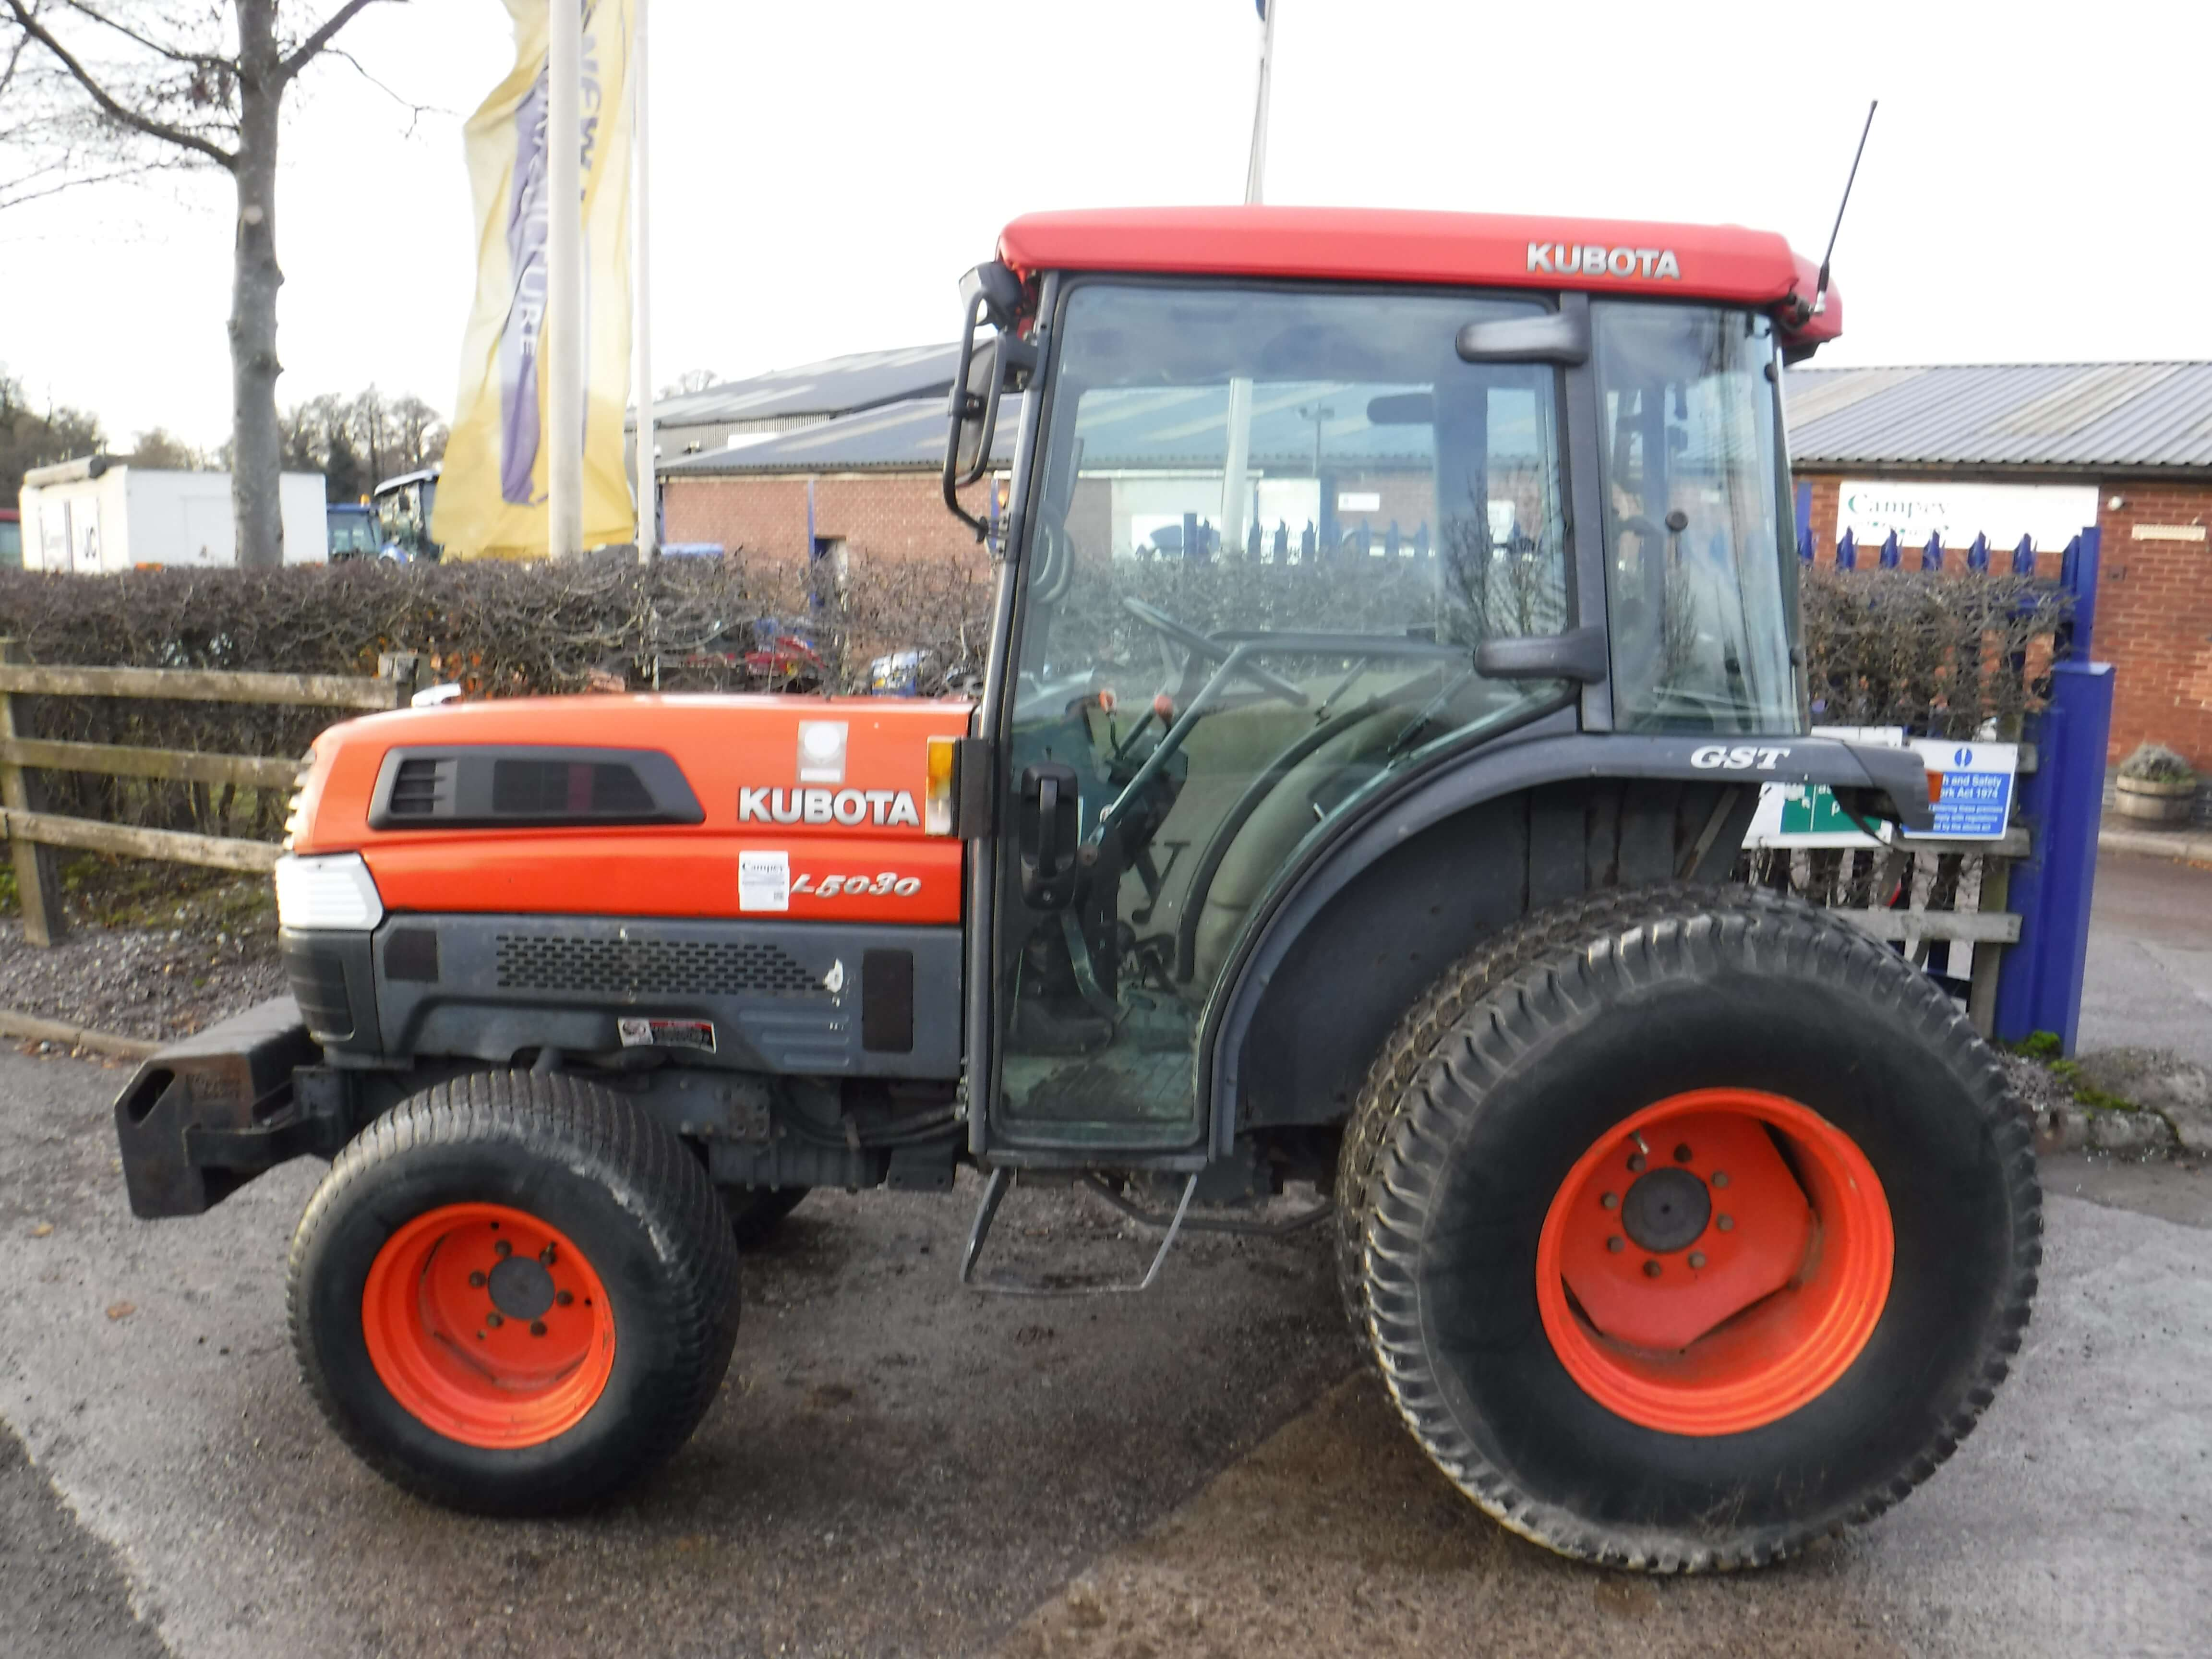 Yanmar 1300d Tractor Parts : L kubota tractor loader parts engine